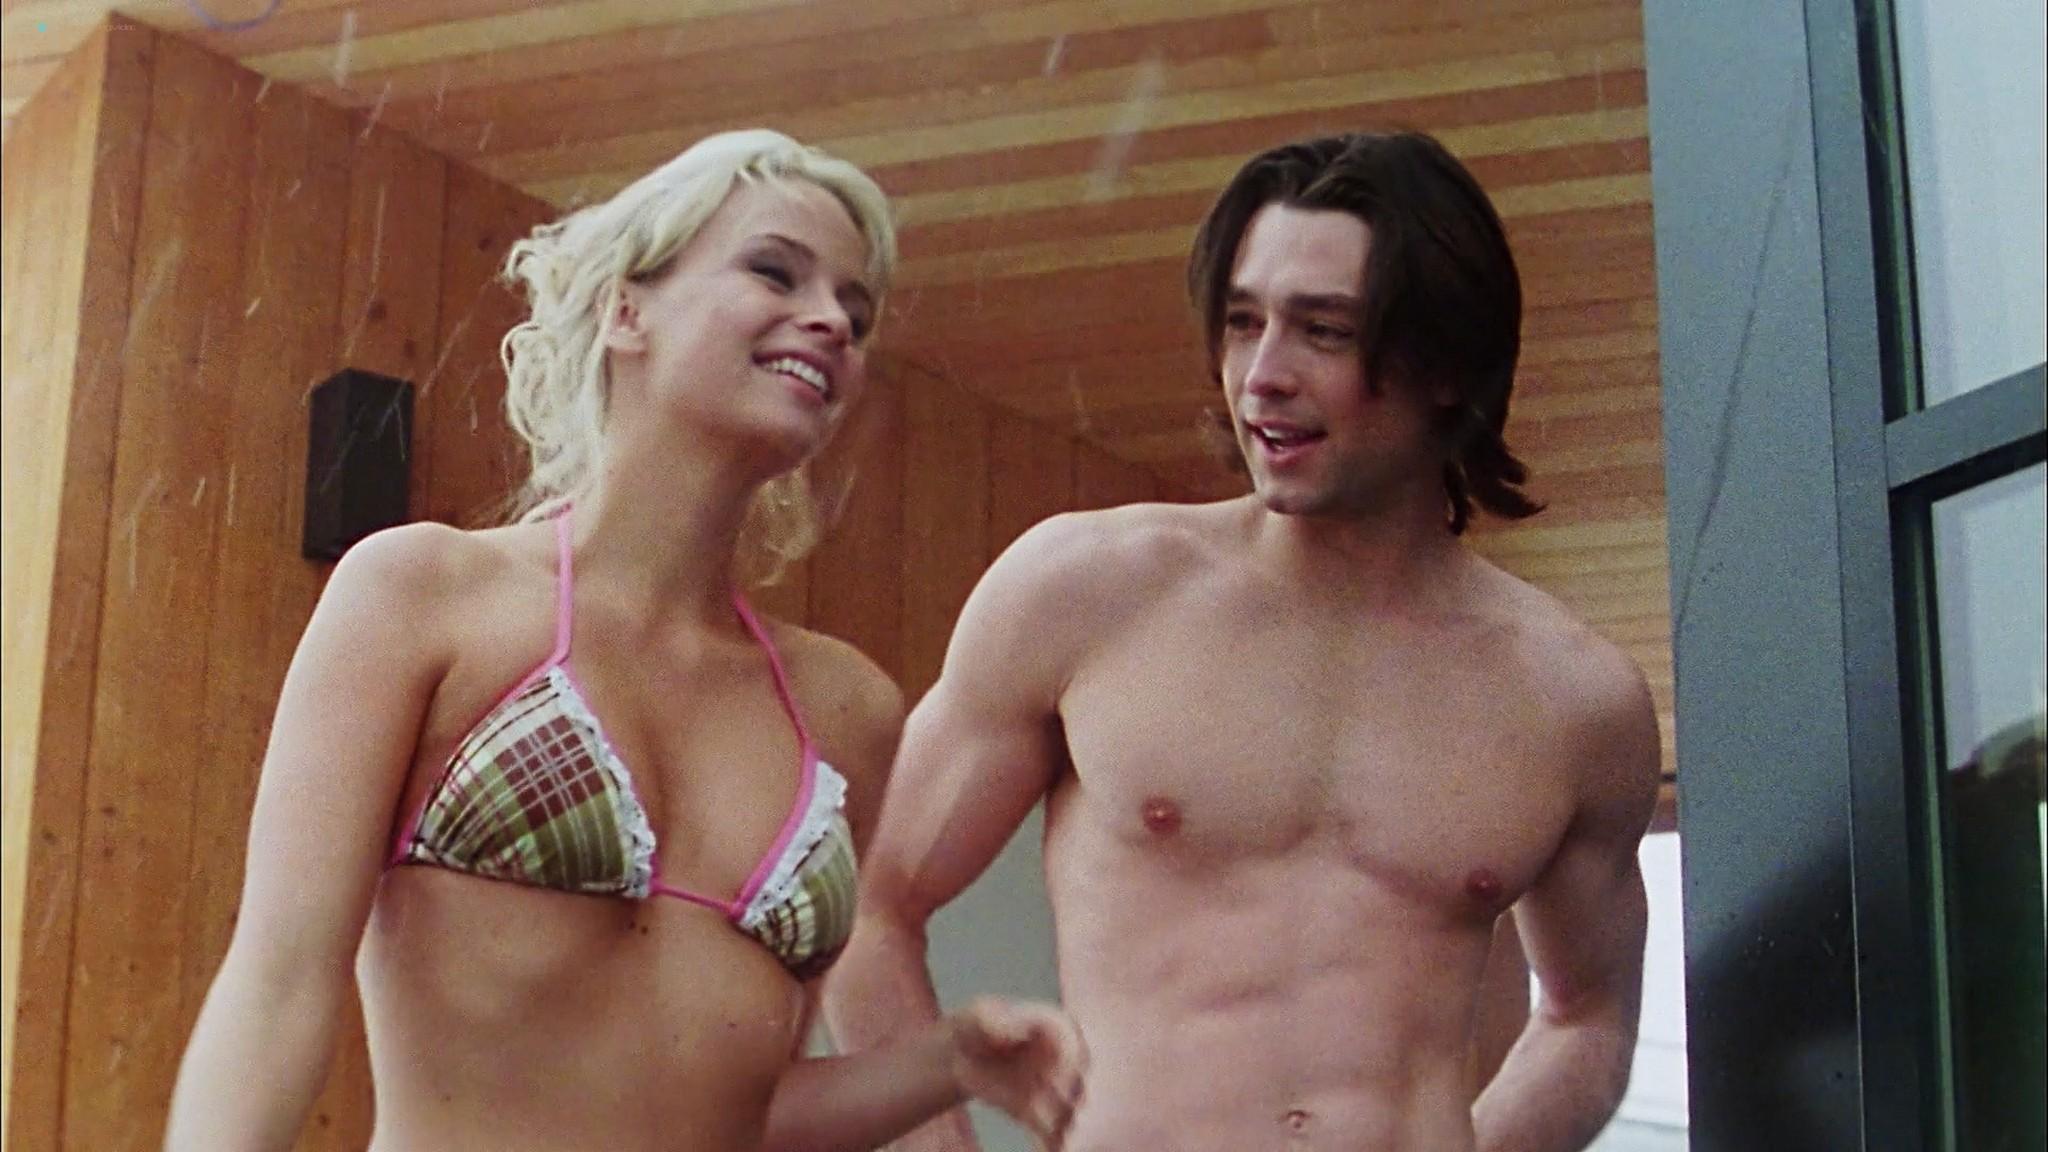 Lindsay Maxwell nude Amber Borycki sexy - Revenge of the Boarding School Dropouts (2009) HD 1080p Web (6)